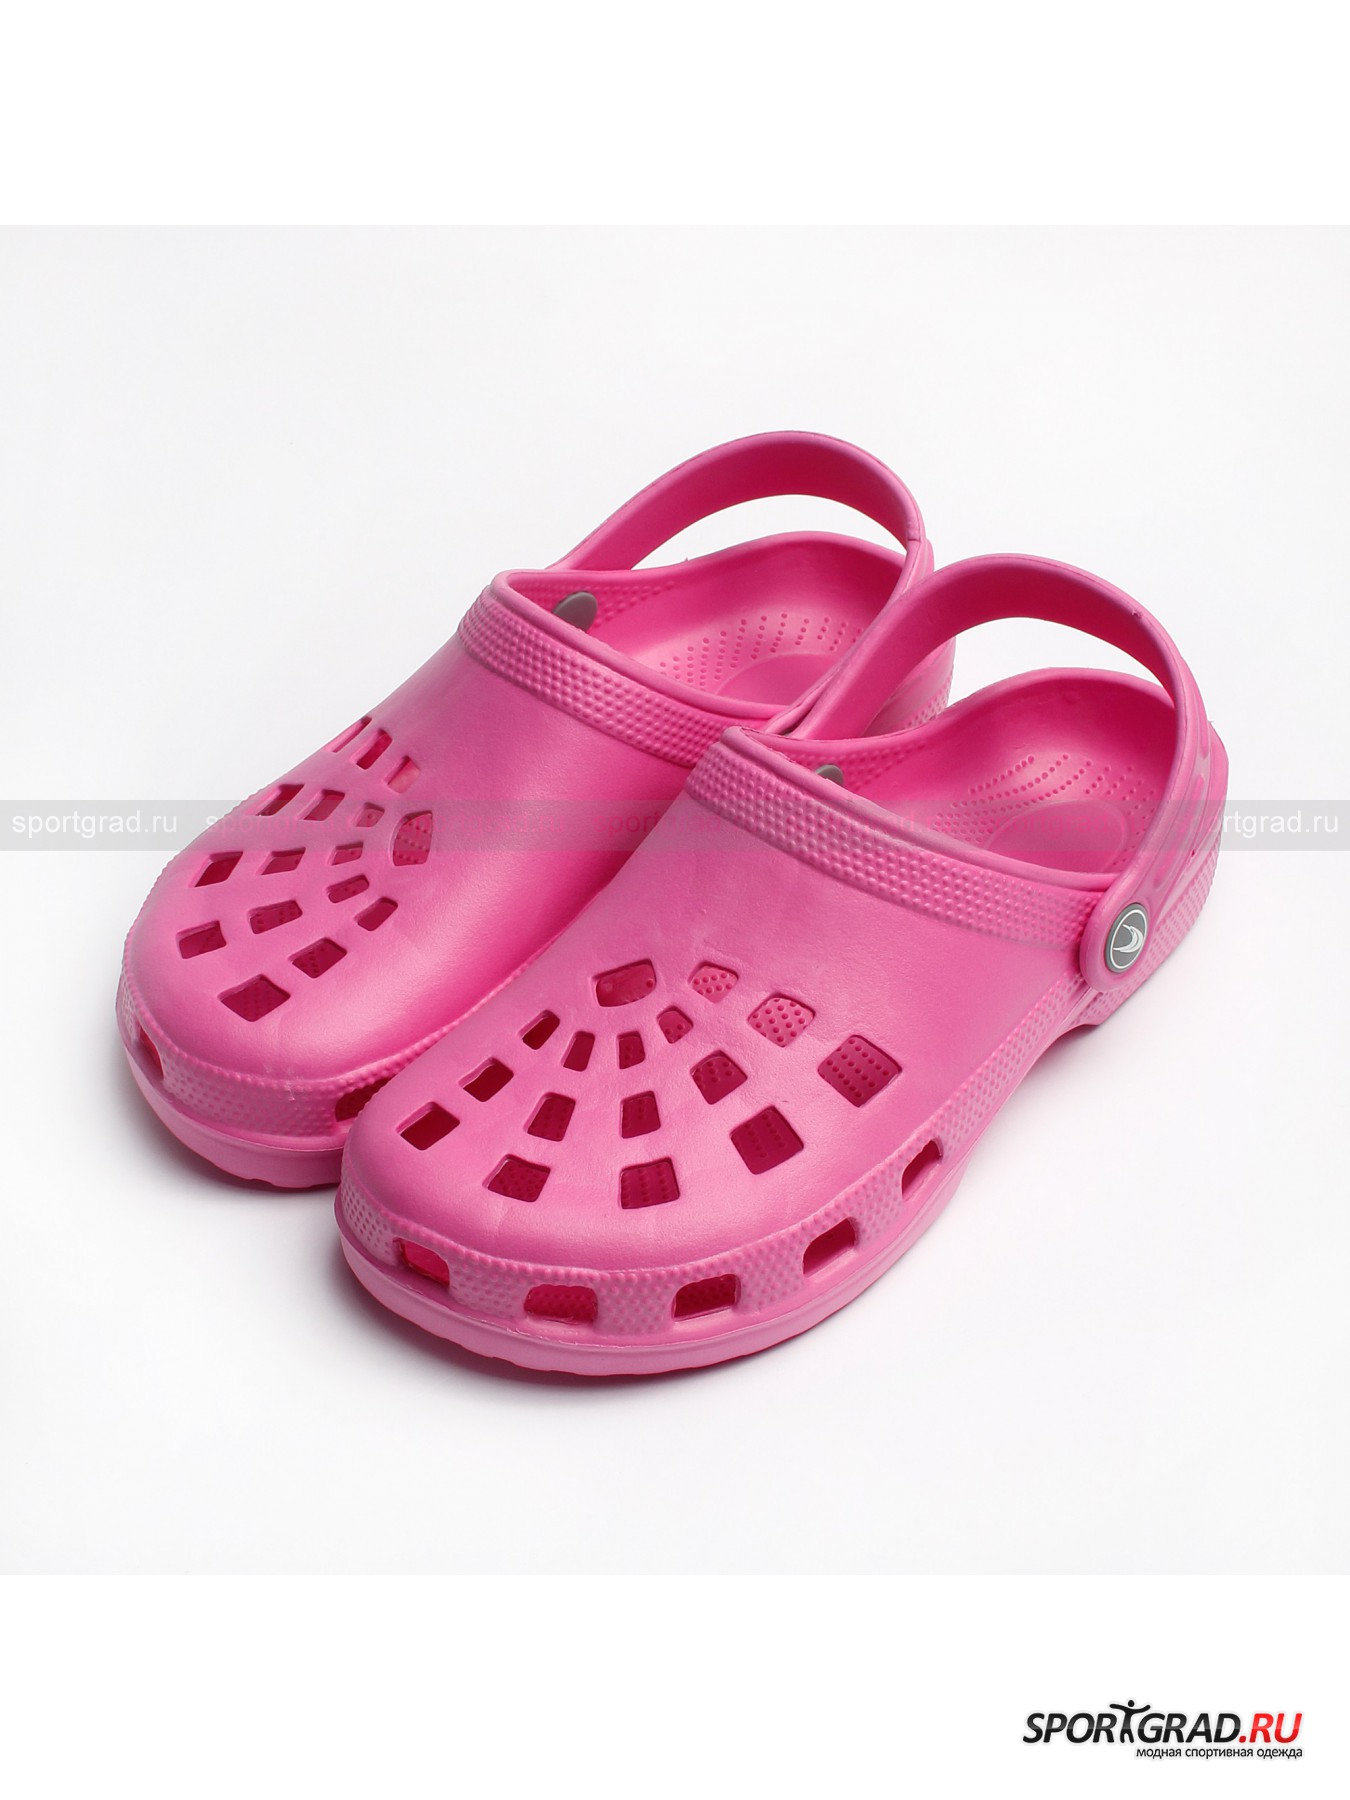 Обувь женская GlogNewMid ICEPEAKСланцы<br>Обувь женская GlogNewMid ICEPEAK<br><br>Пол: Женский<br>Возраст: Взрослый<br>Тип: Сланцы